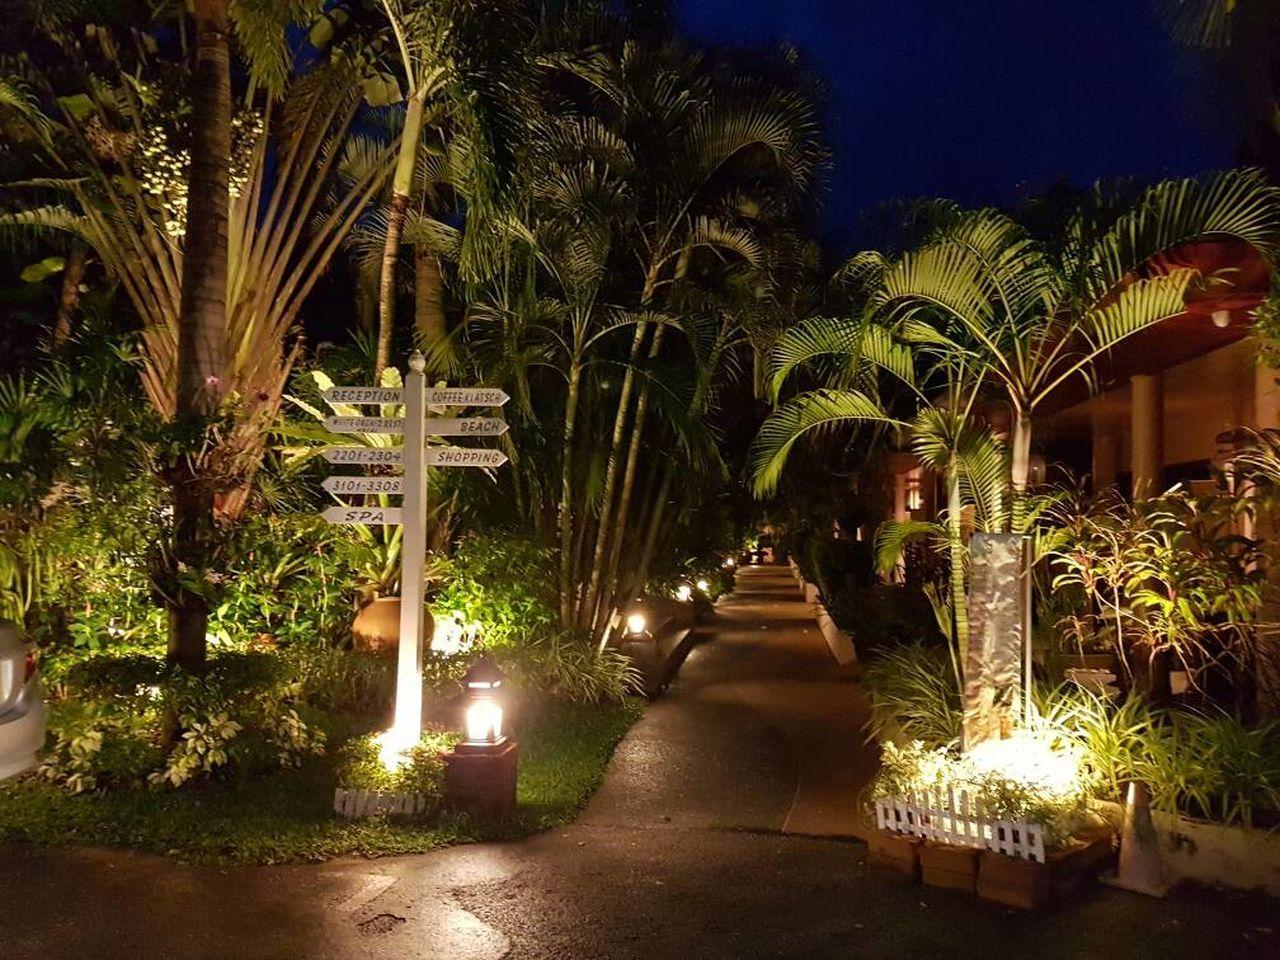 night, palm tree, illuminated, tree, plant, no people, growth, luxury, nature, outdoors, sky